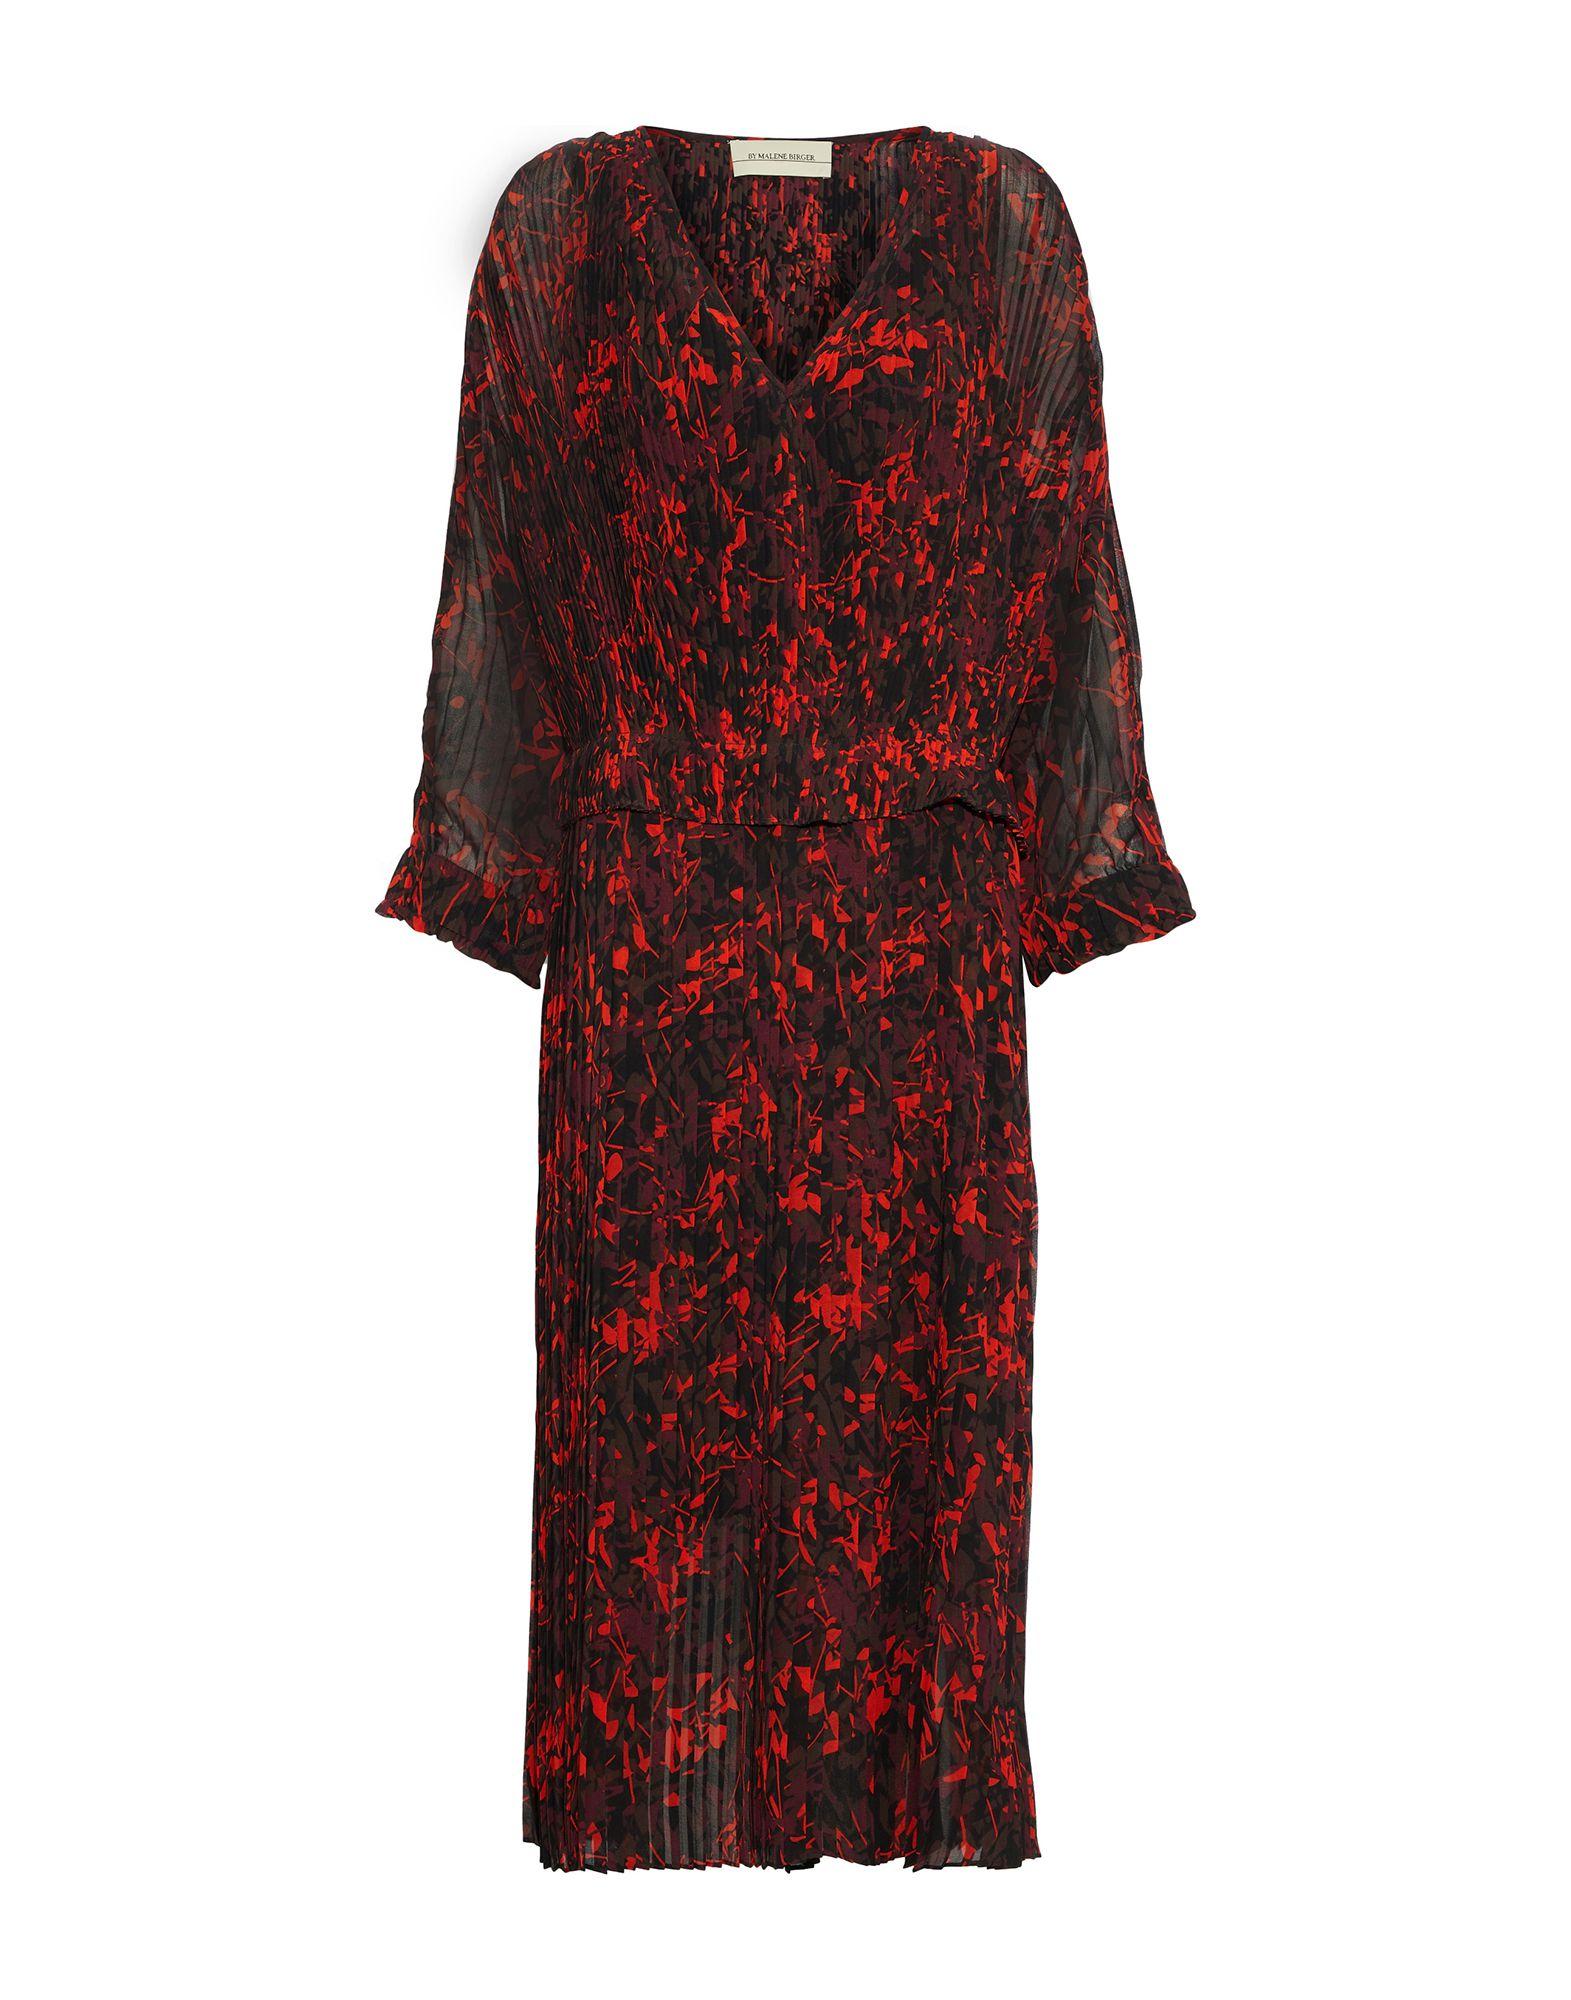 BY MALENE BIRGER Платье длиной 3/4